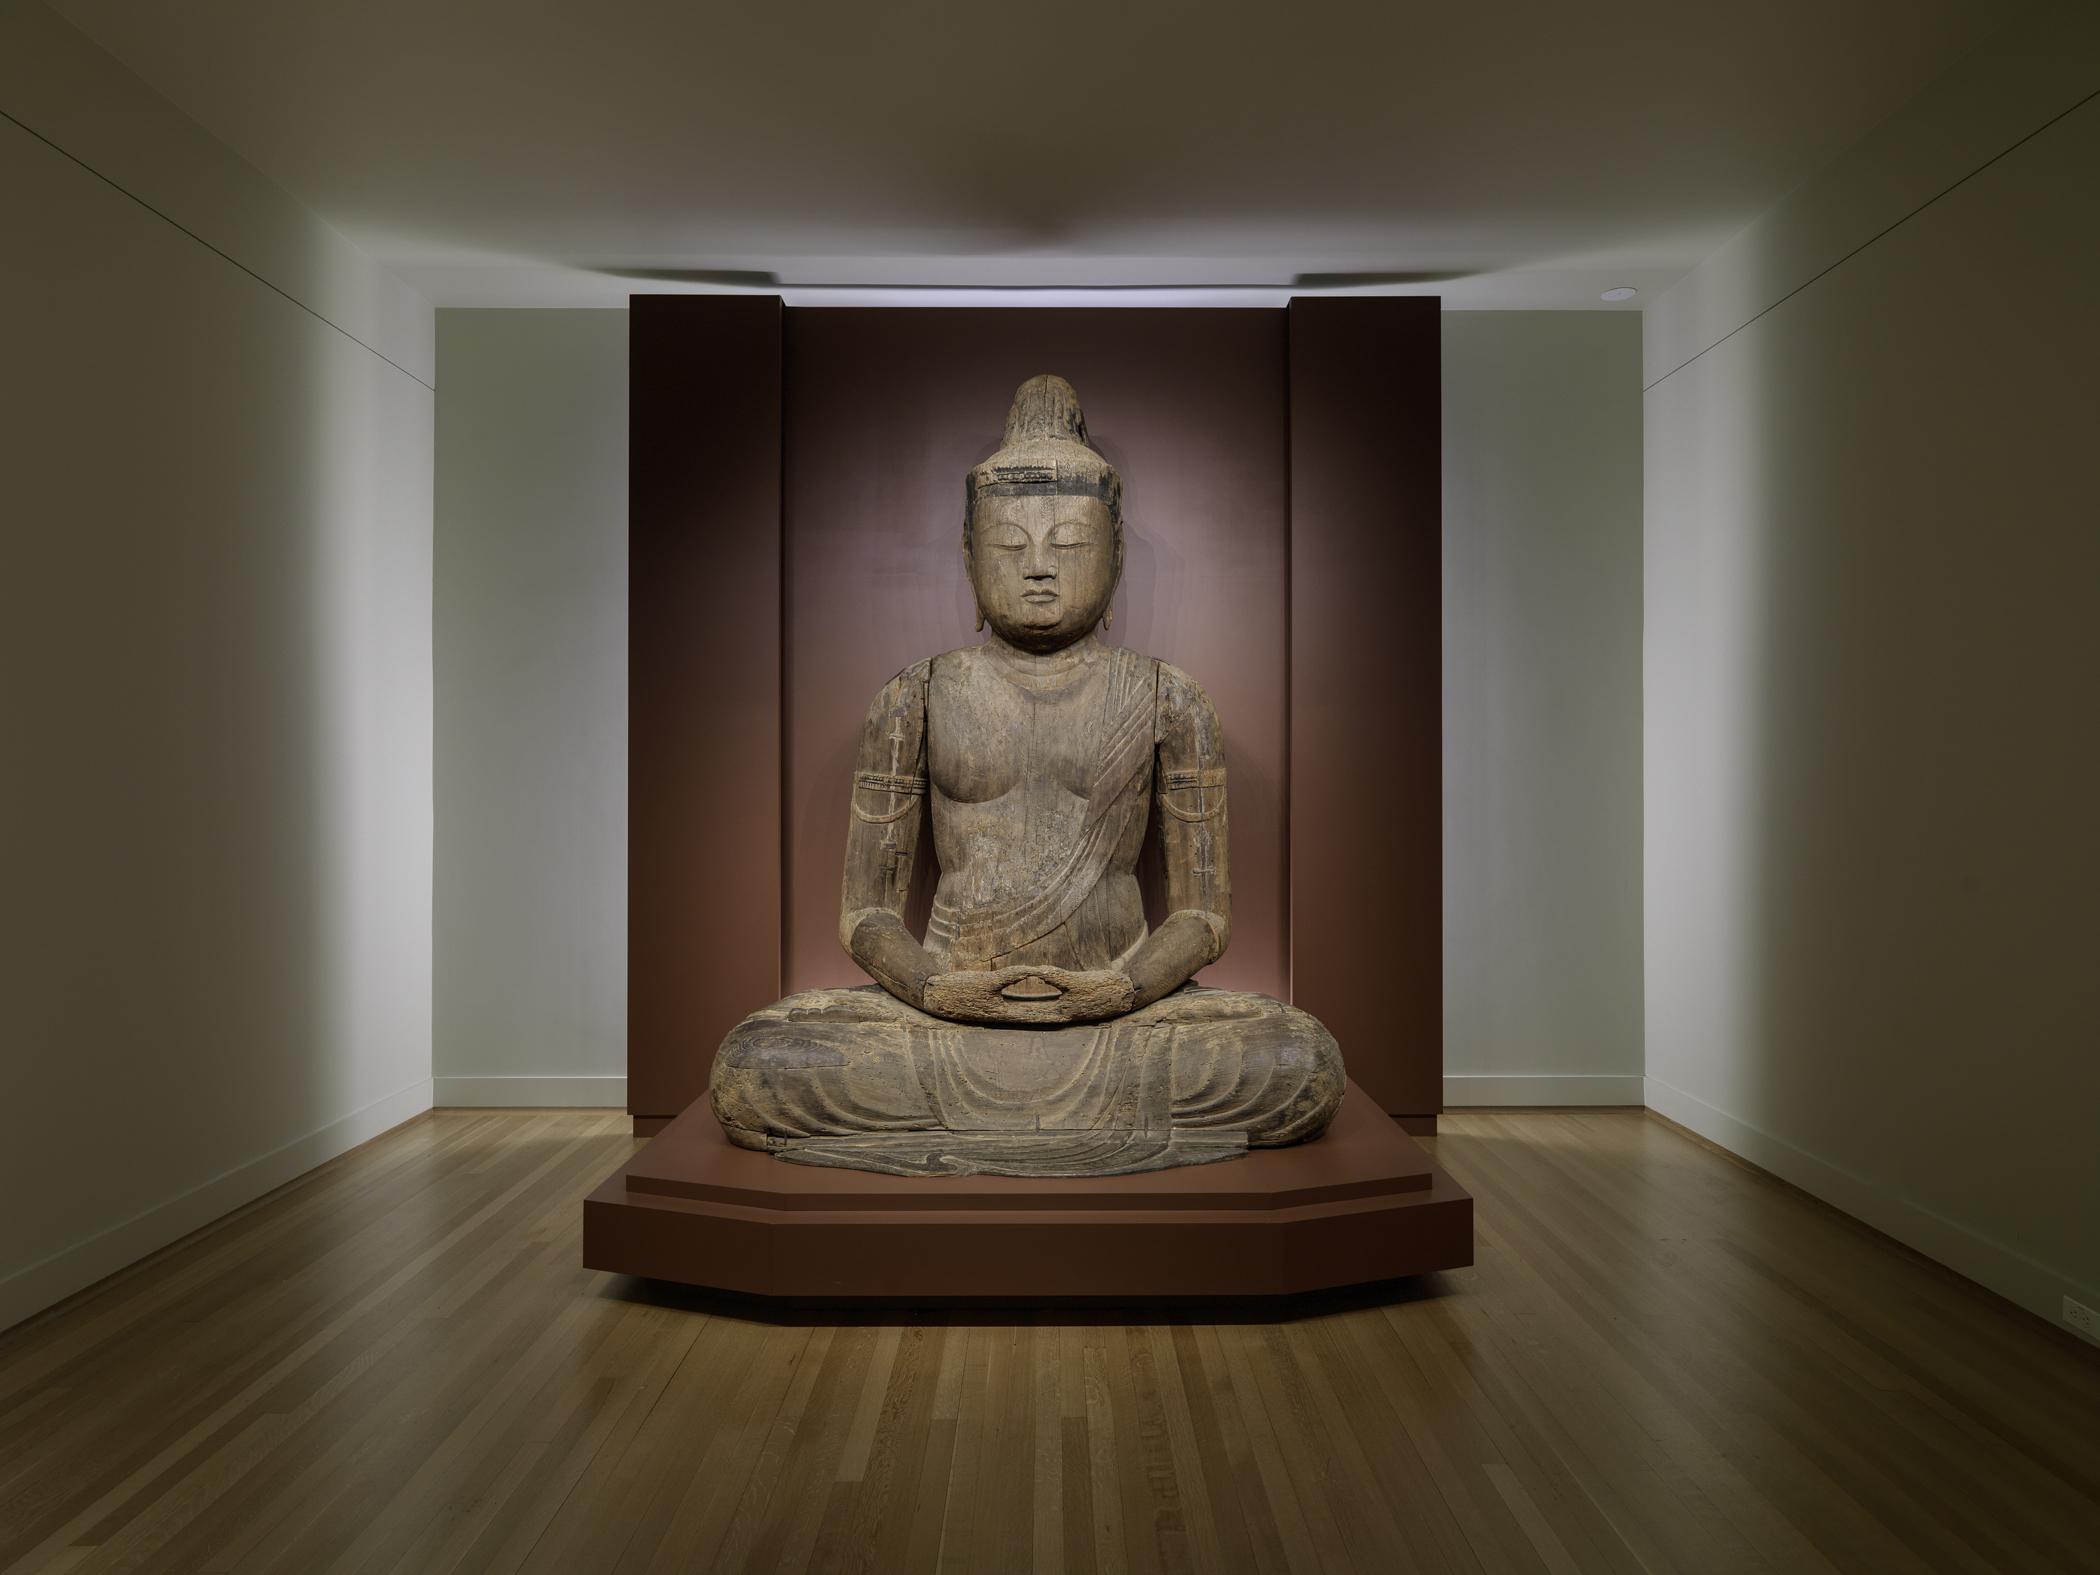 Japanese Dainichi Nyorai Buddha (ca. 1150-1200) on back-lit platform